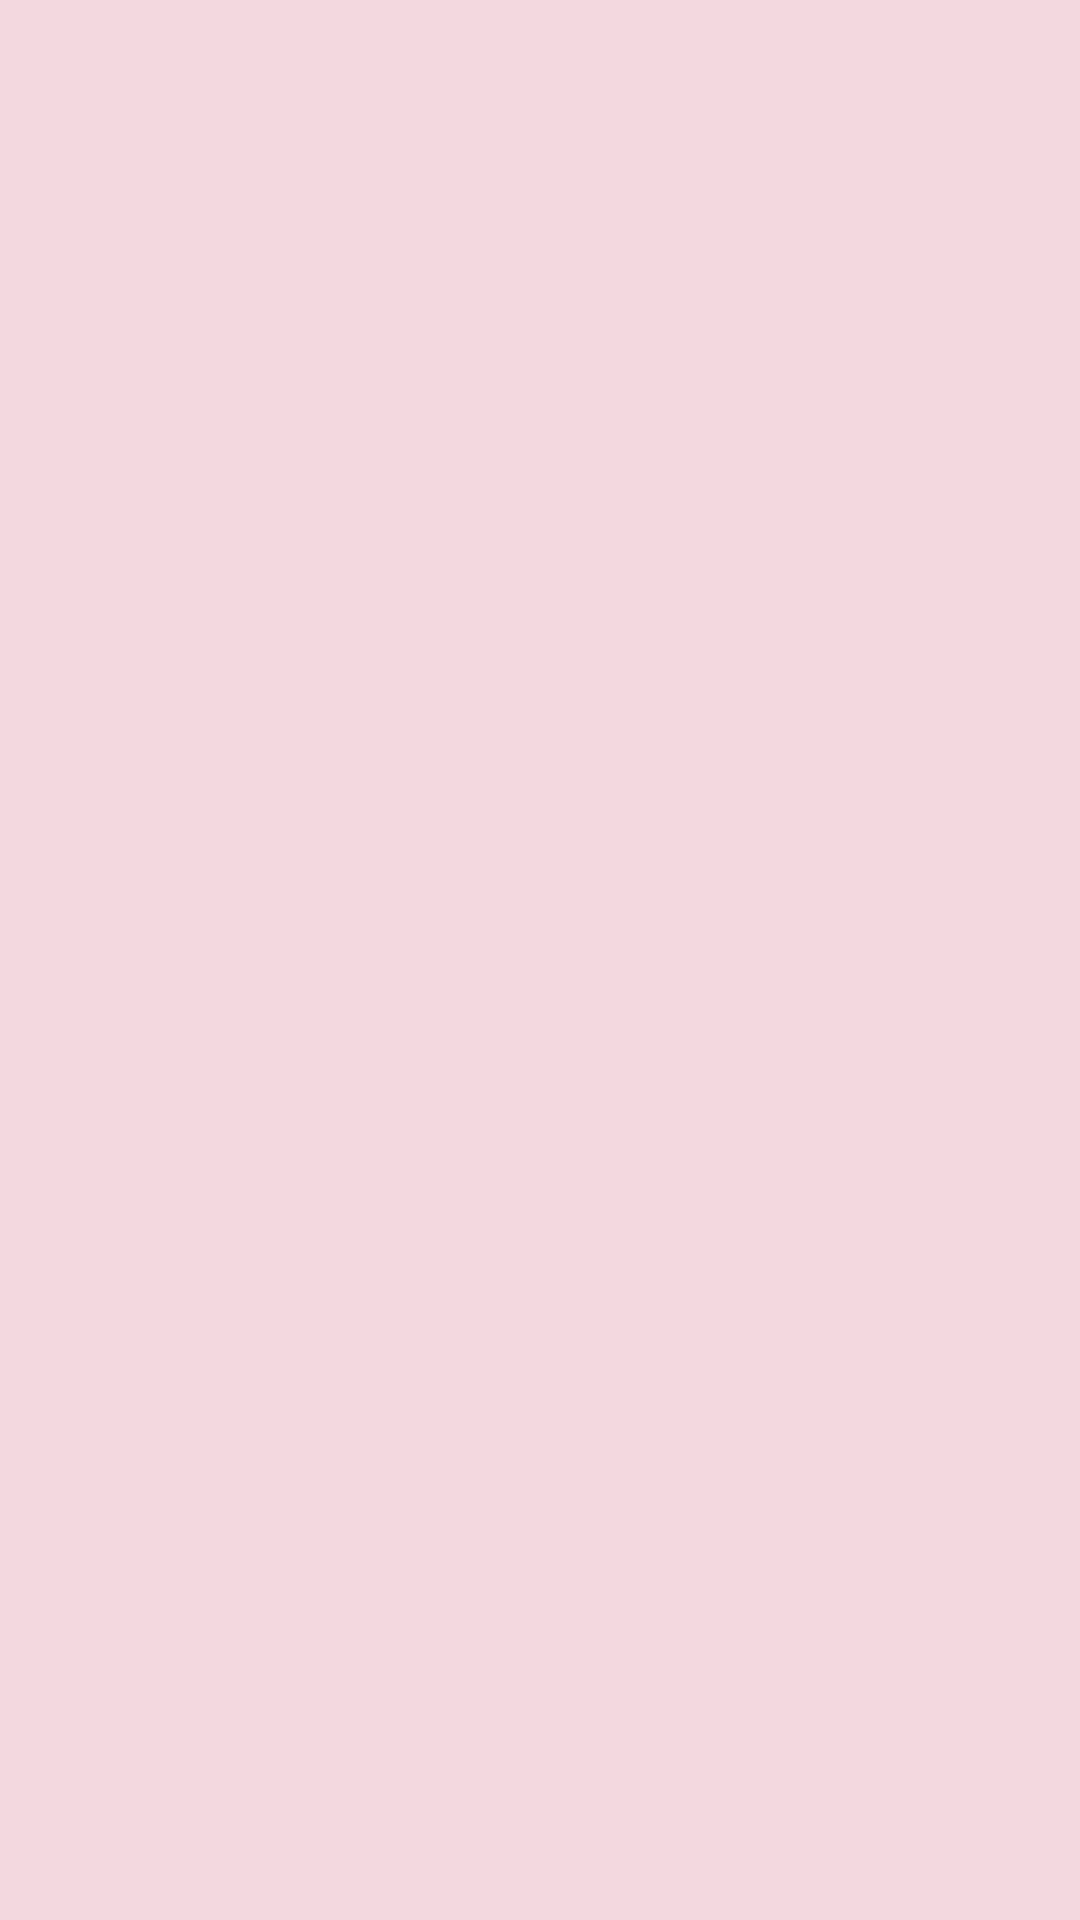 1080x1920 Vanilla Ice Solid Color Background